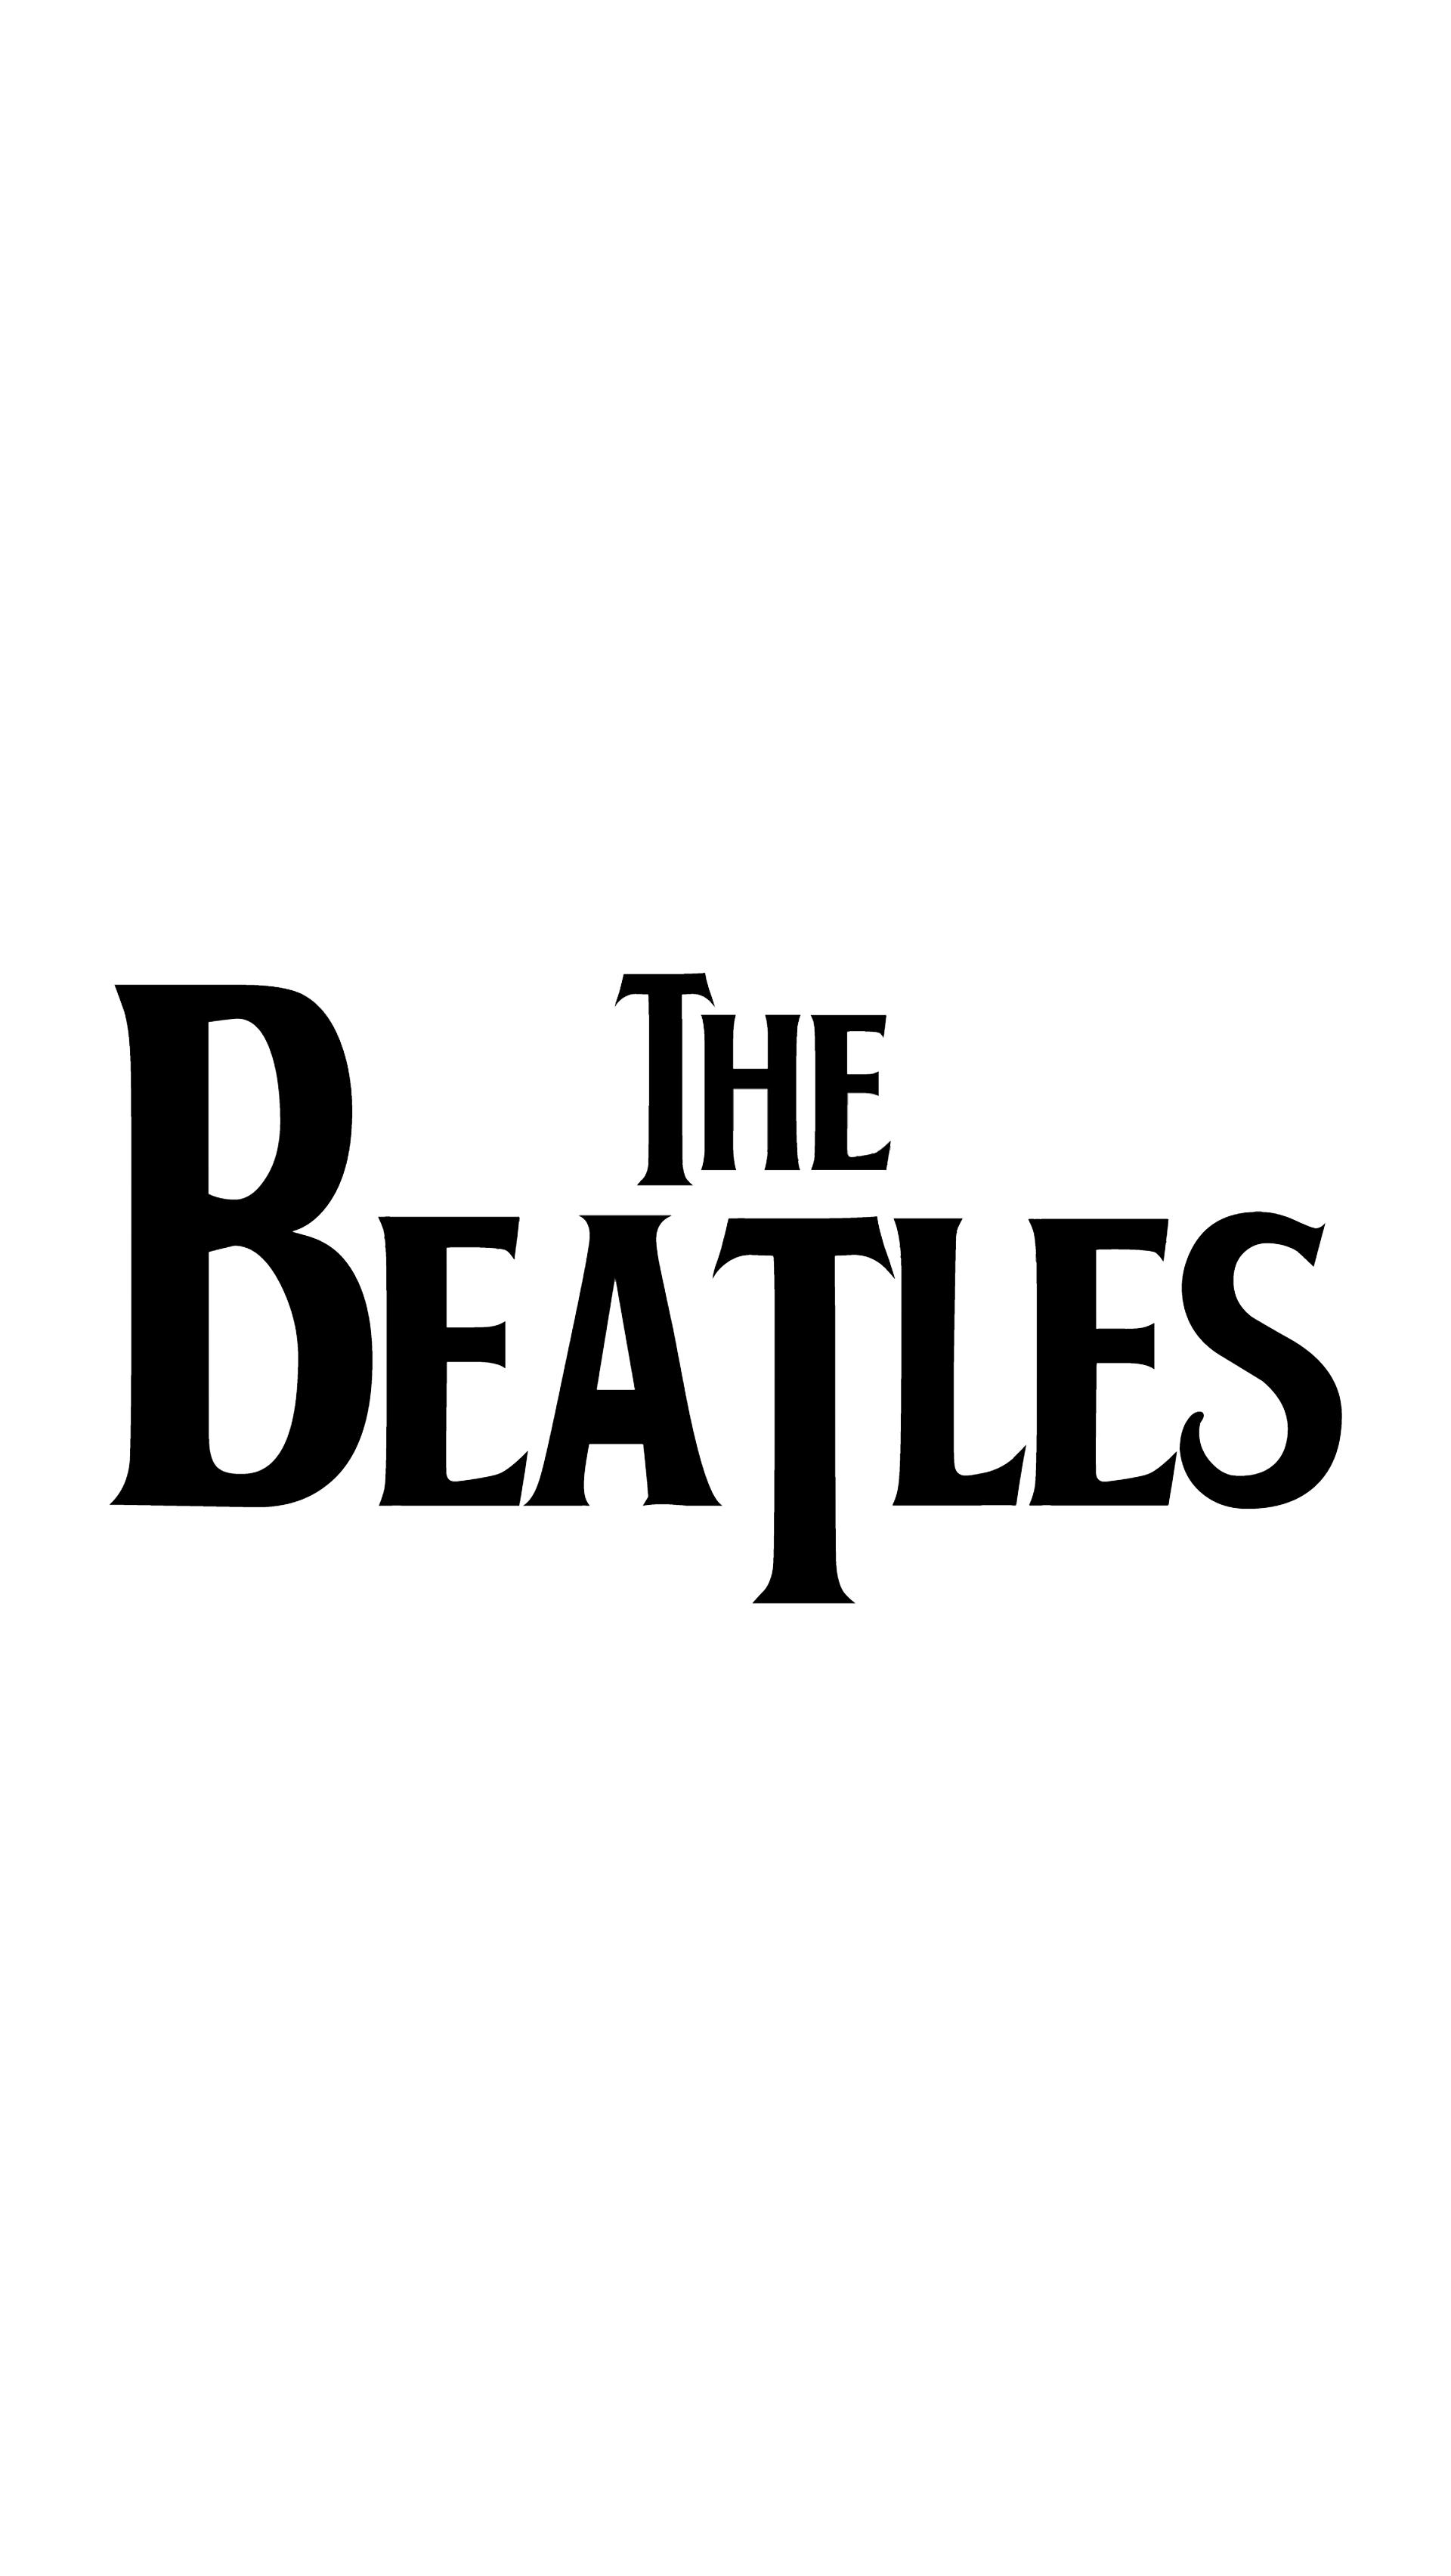 Oasis Wallpaper Iphone 5 The Beatles